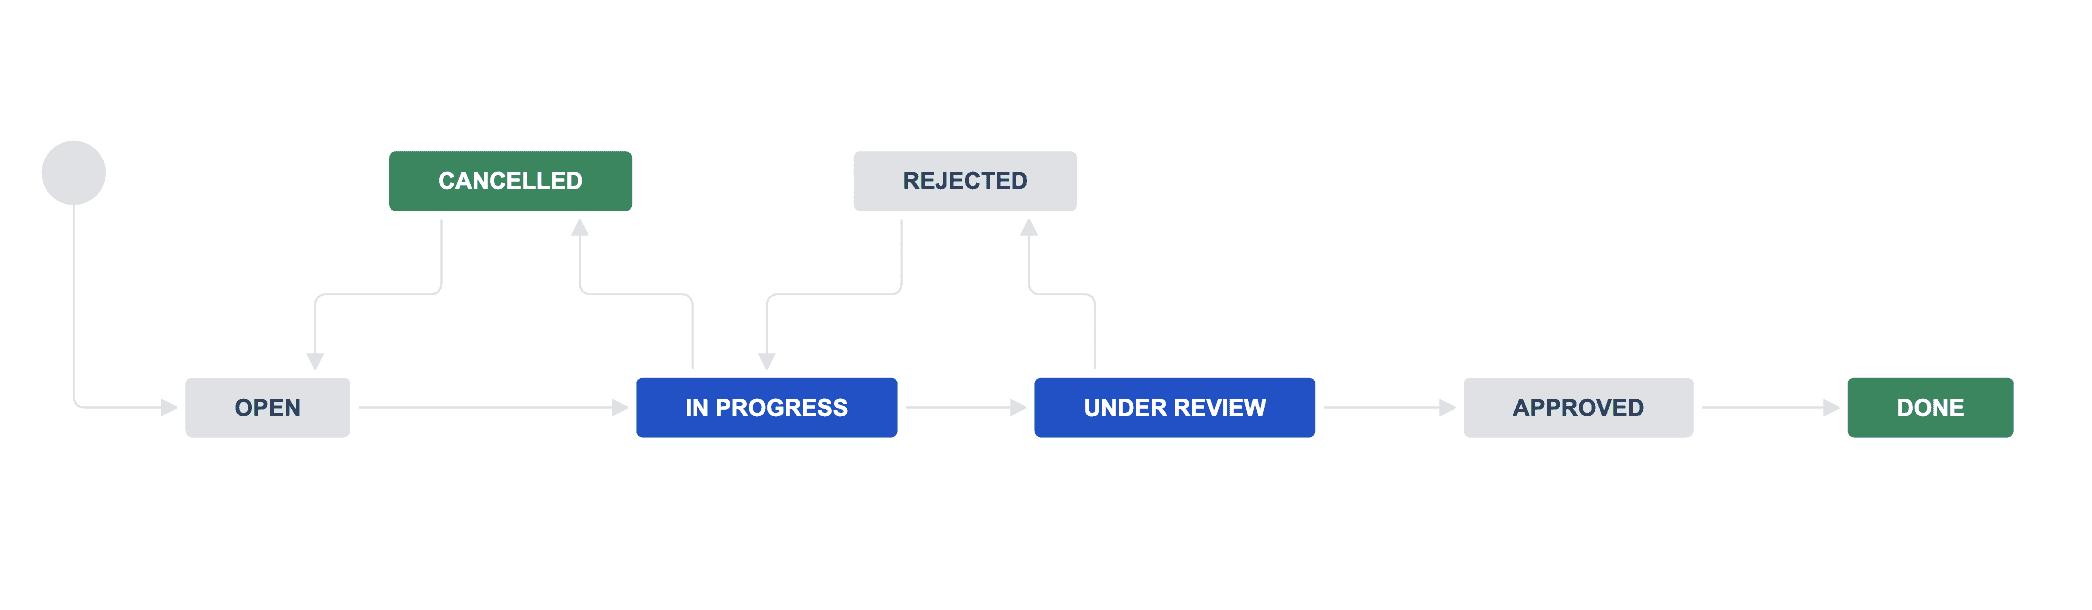 Jira Support & Service Workflow